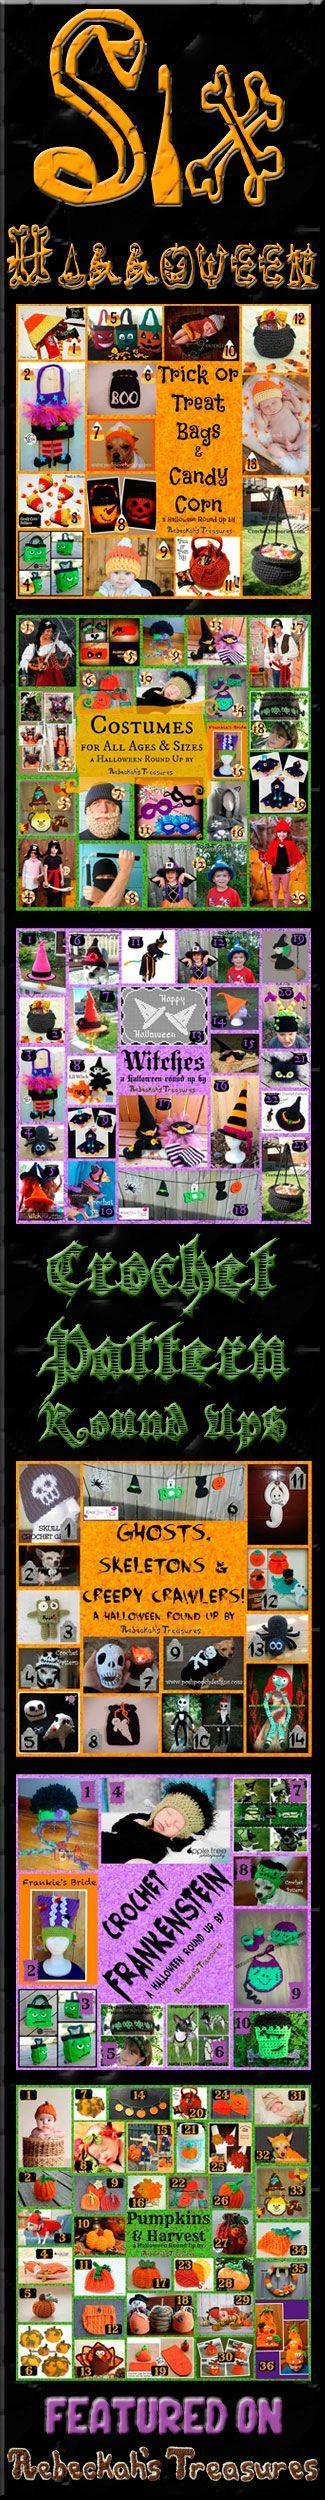 Six Halloween Crochet Pattern Round Ups via @beckastreasures - Featuring 26 designers and 100+ patterns!